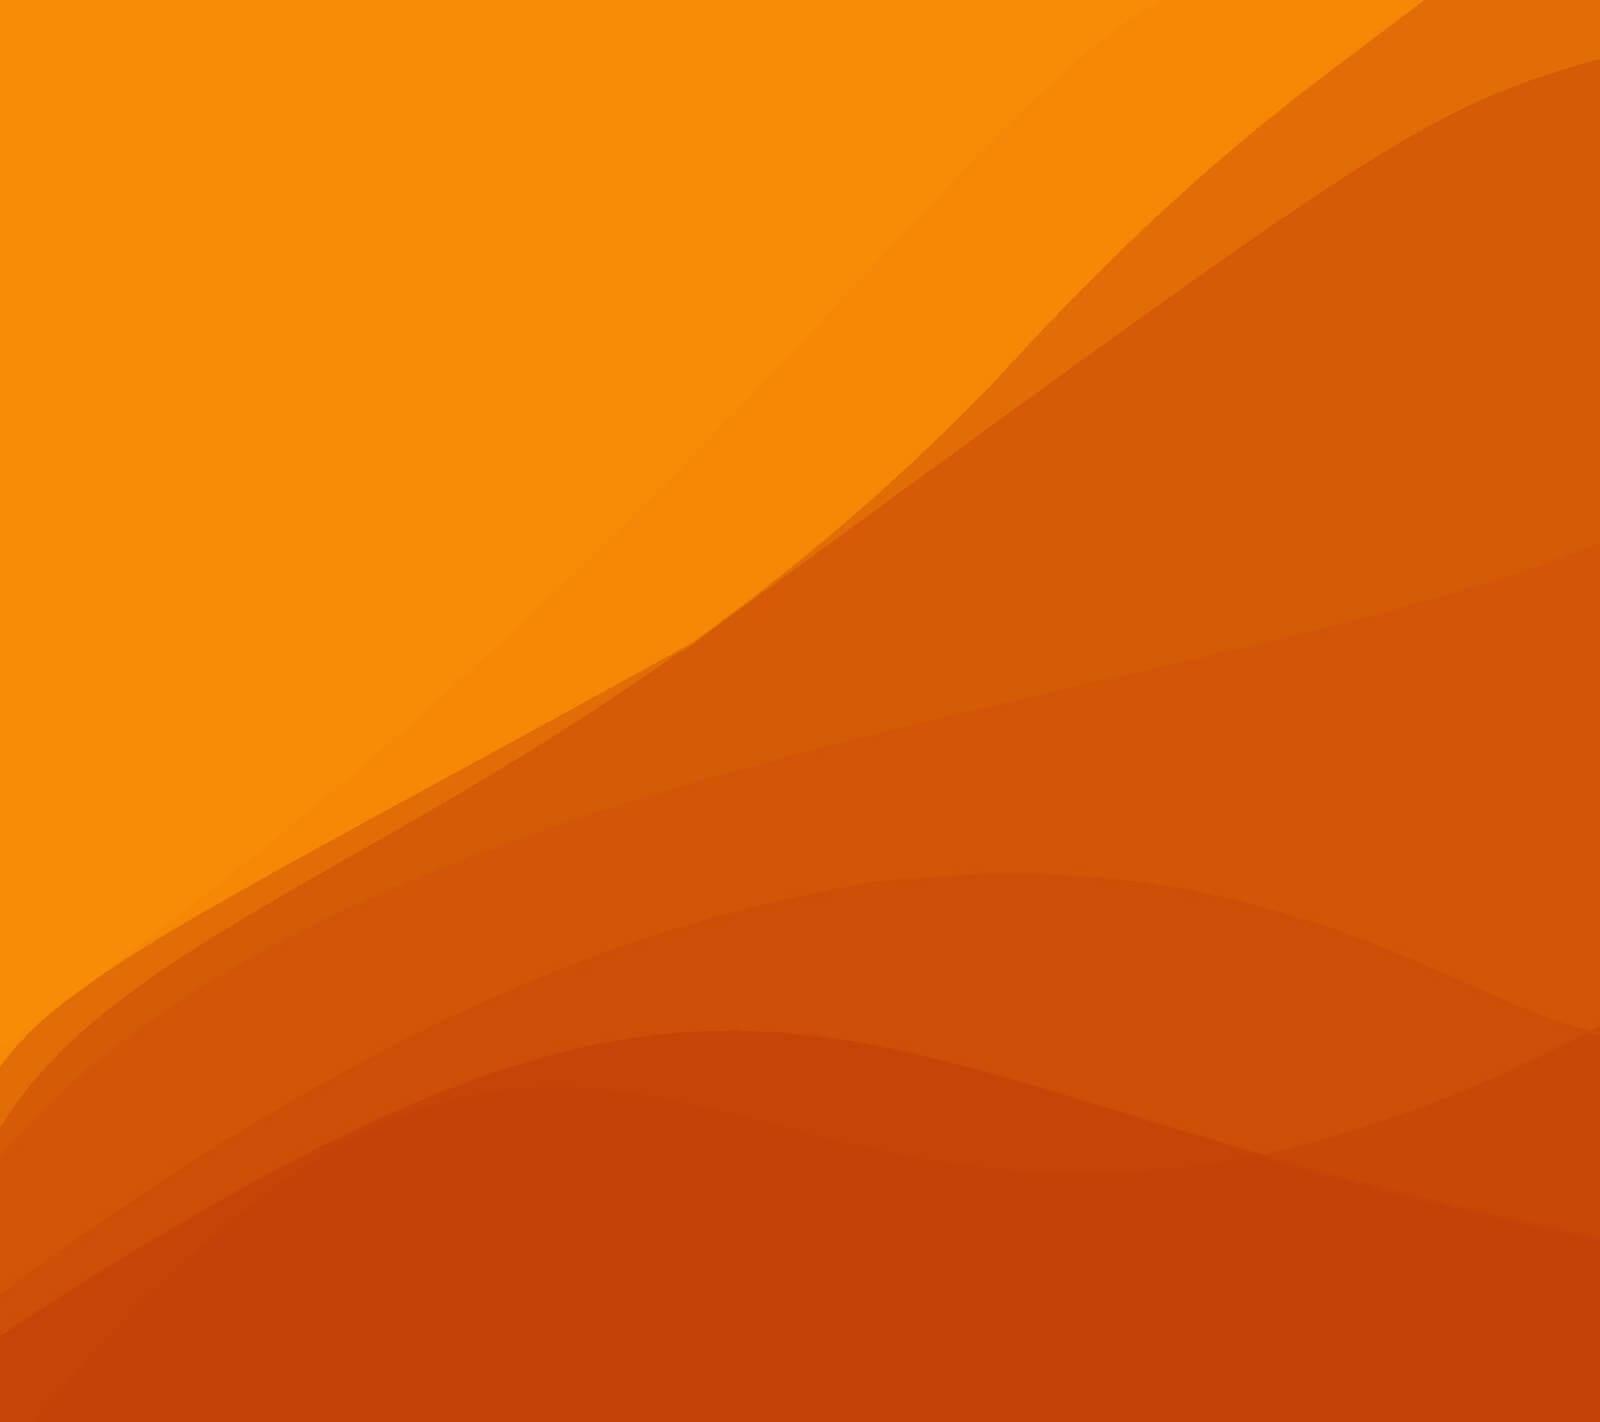 Xperia lollipop wallaper orange